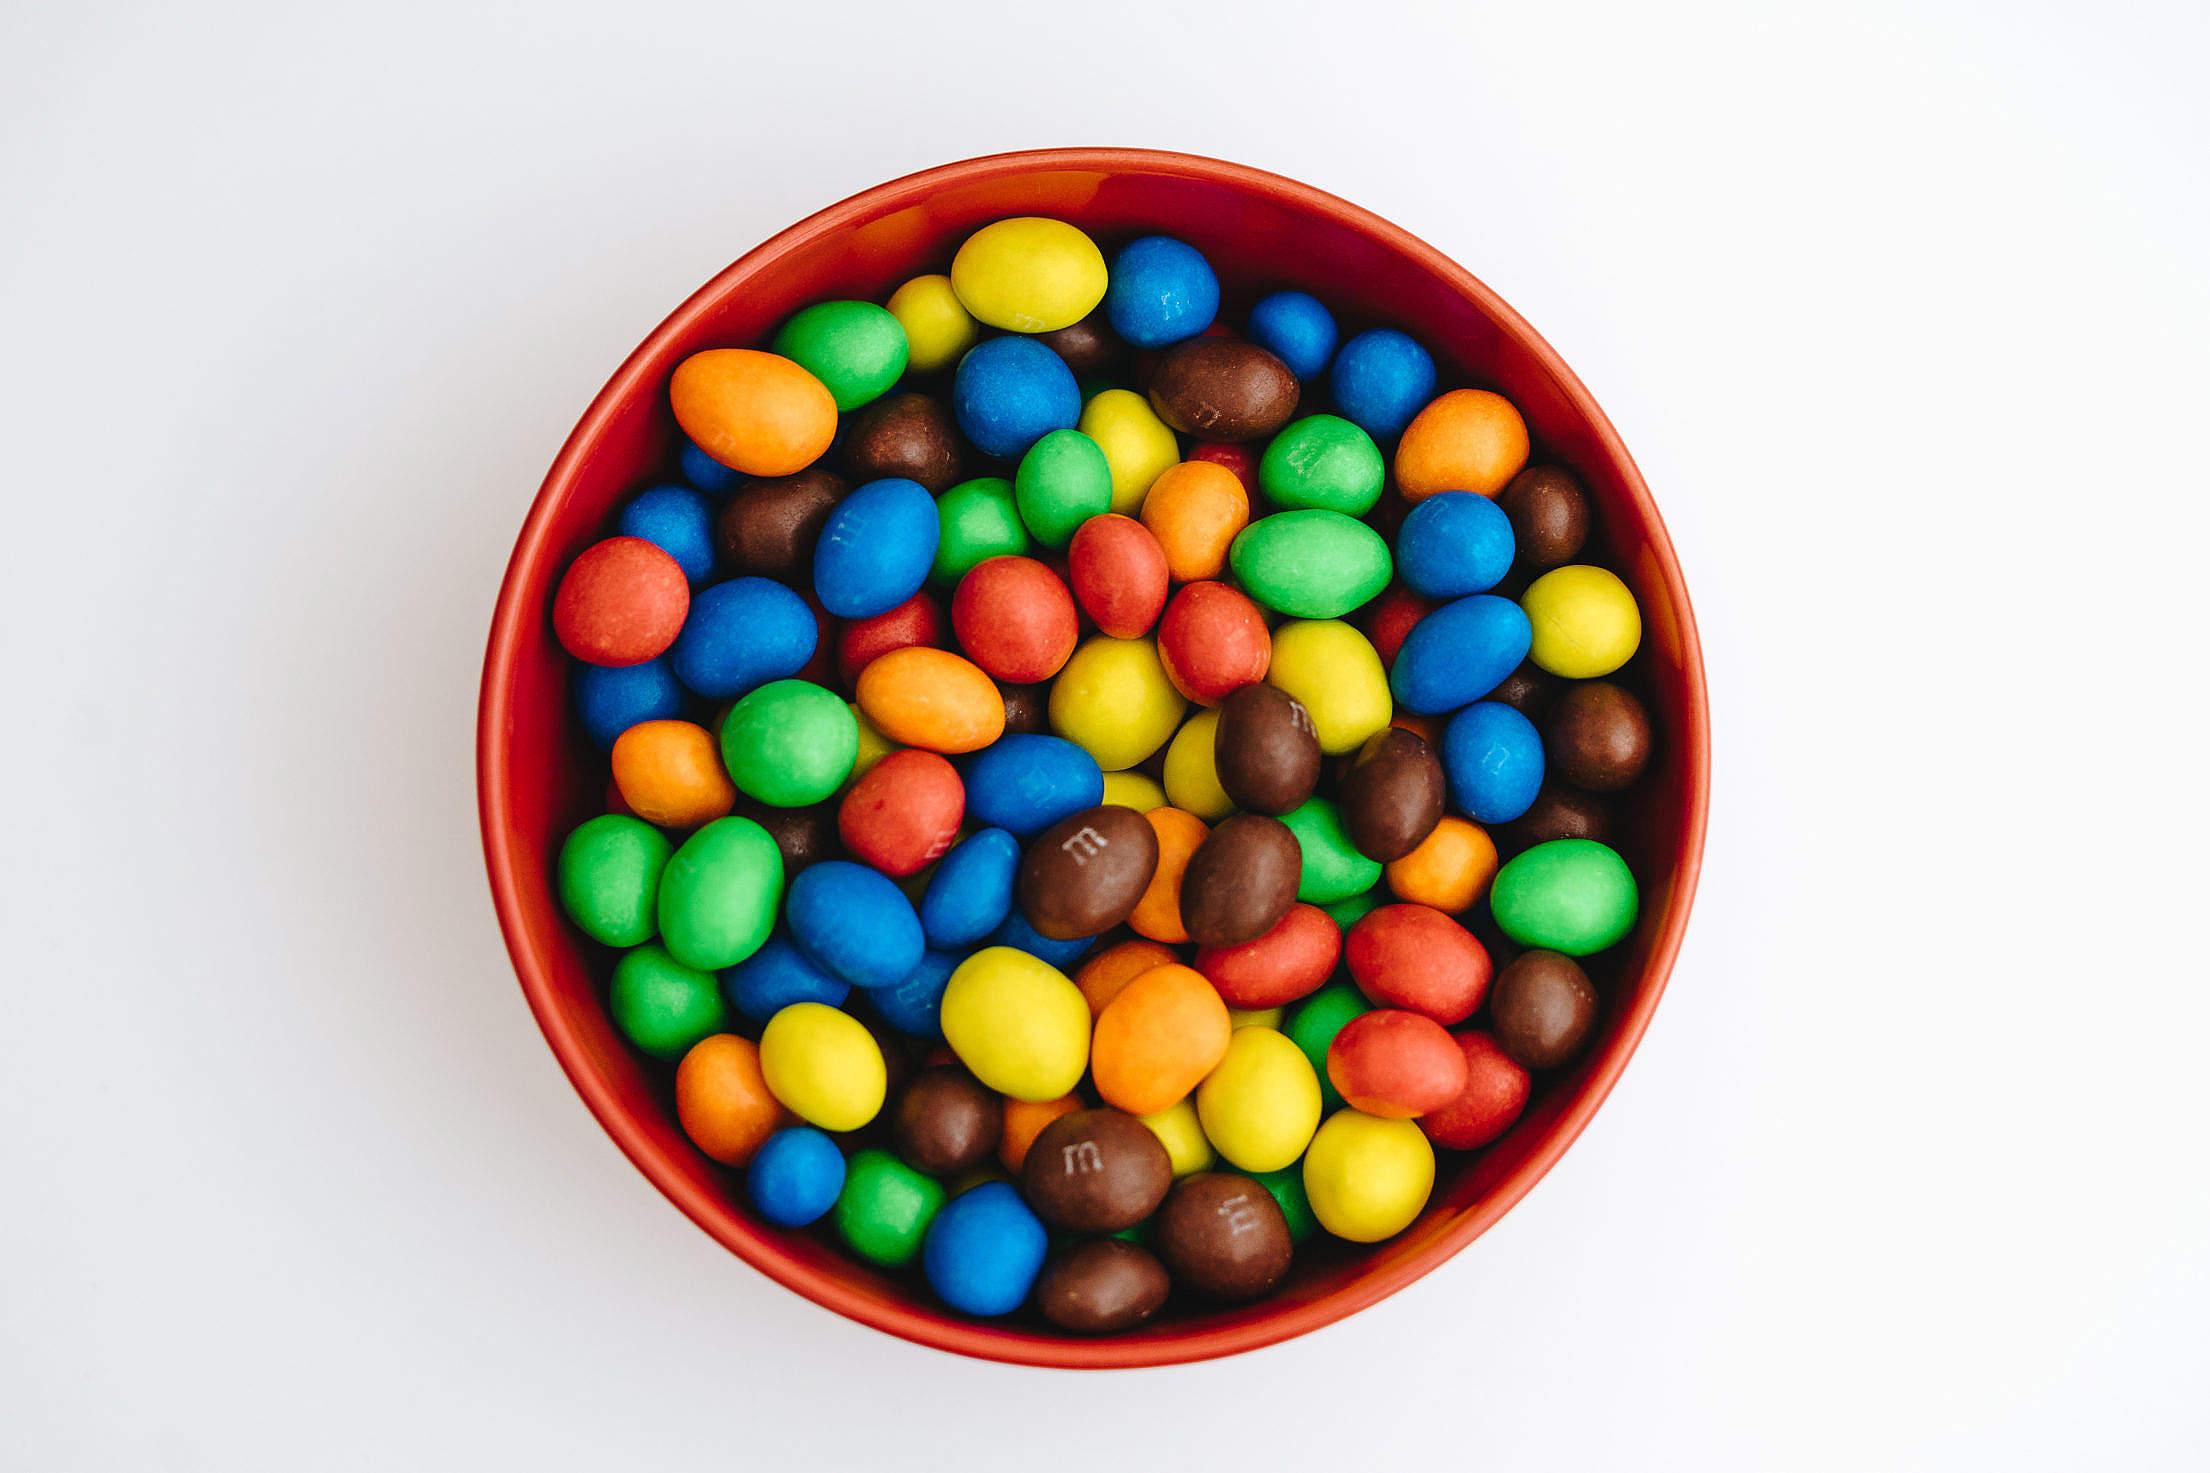 Tasty M&M's Peanut Chocolates in a Bowl Free Stock Photo